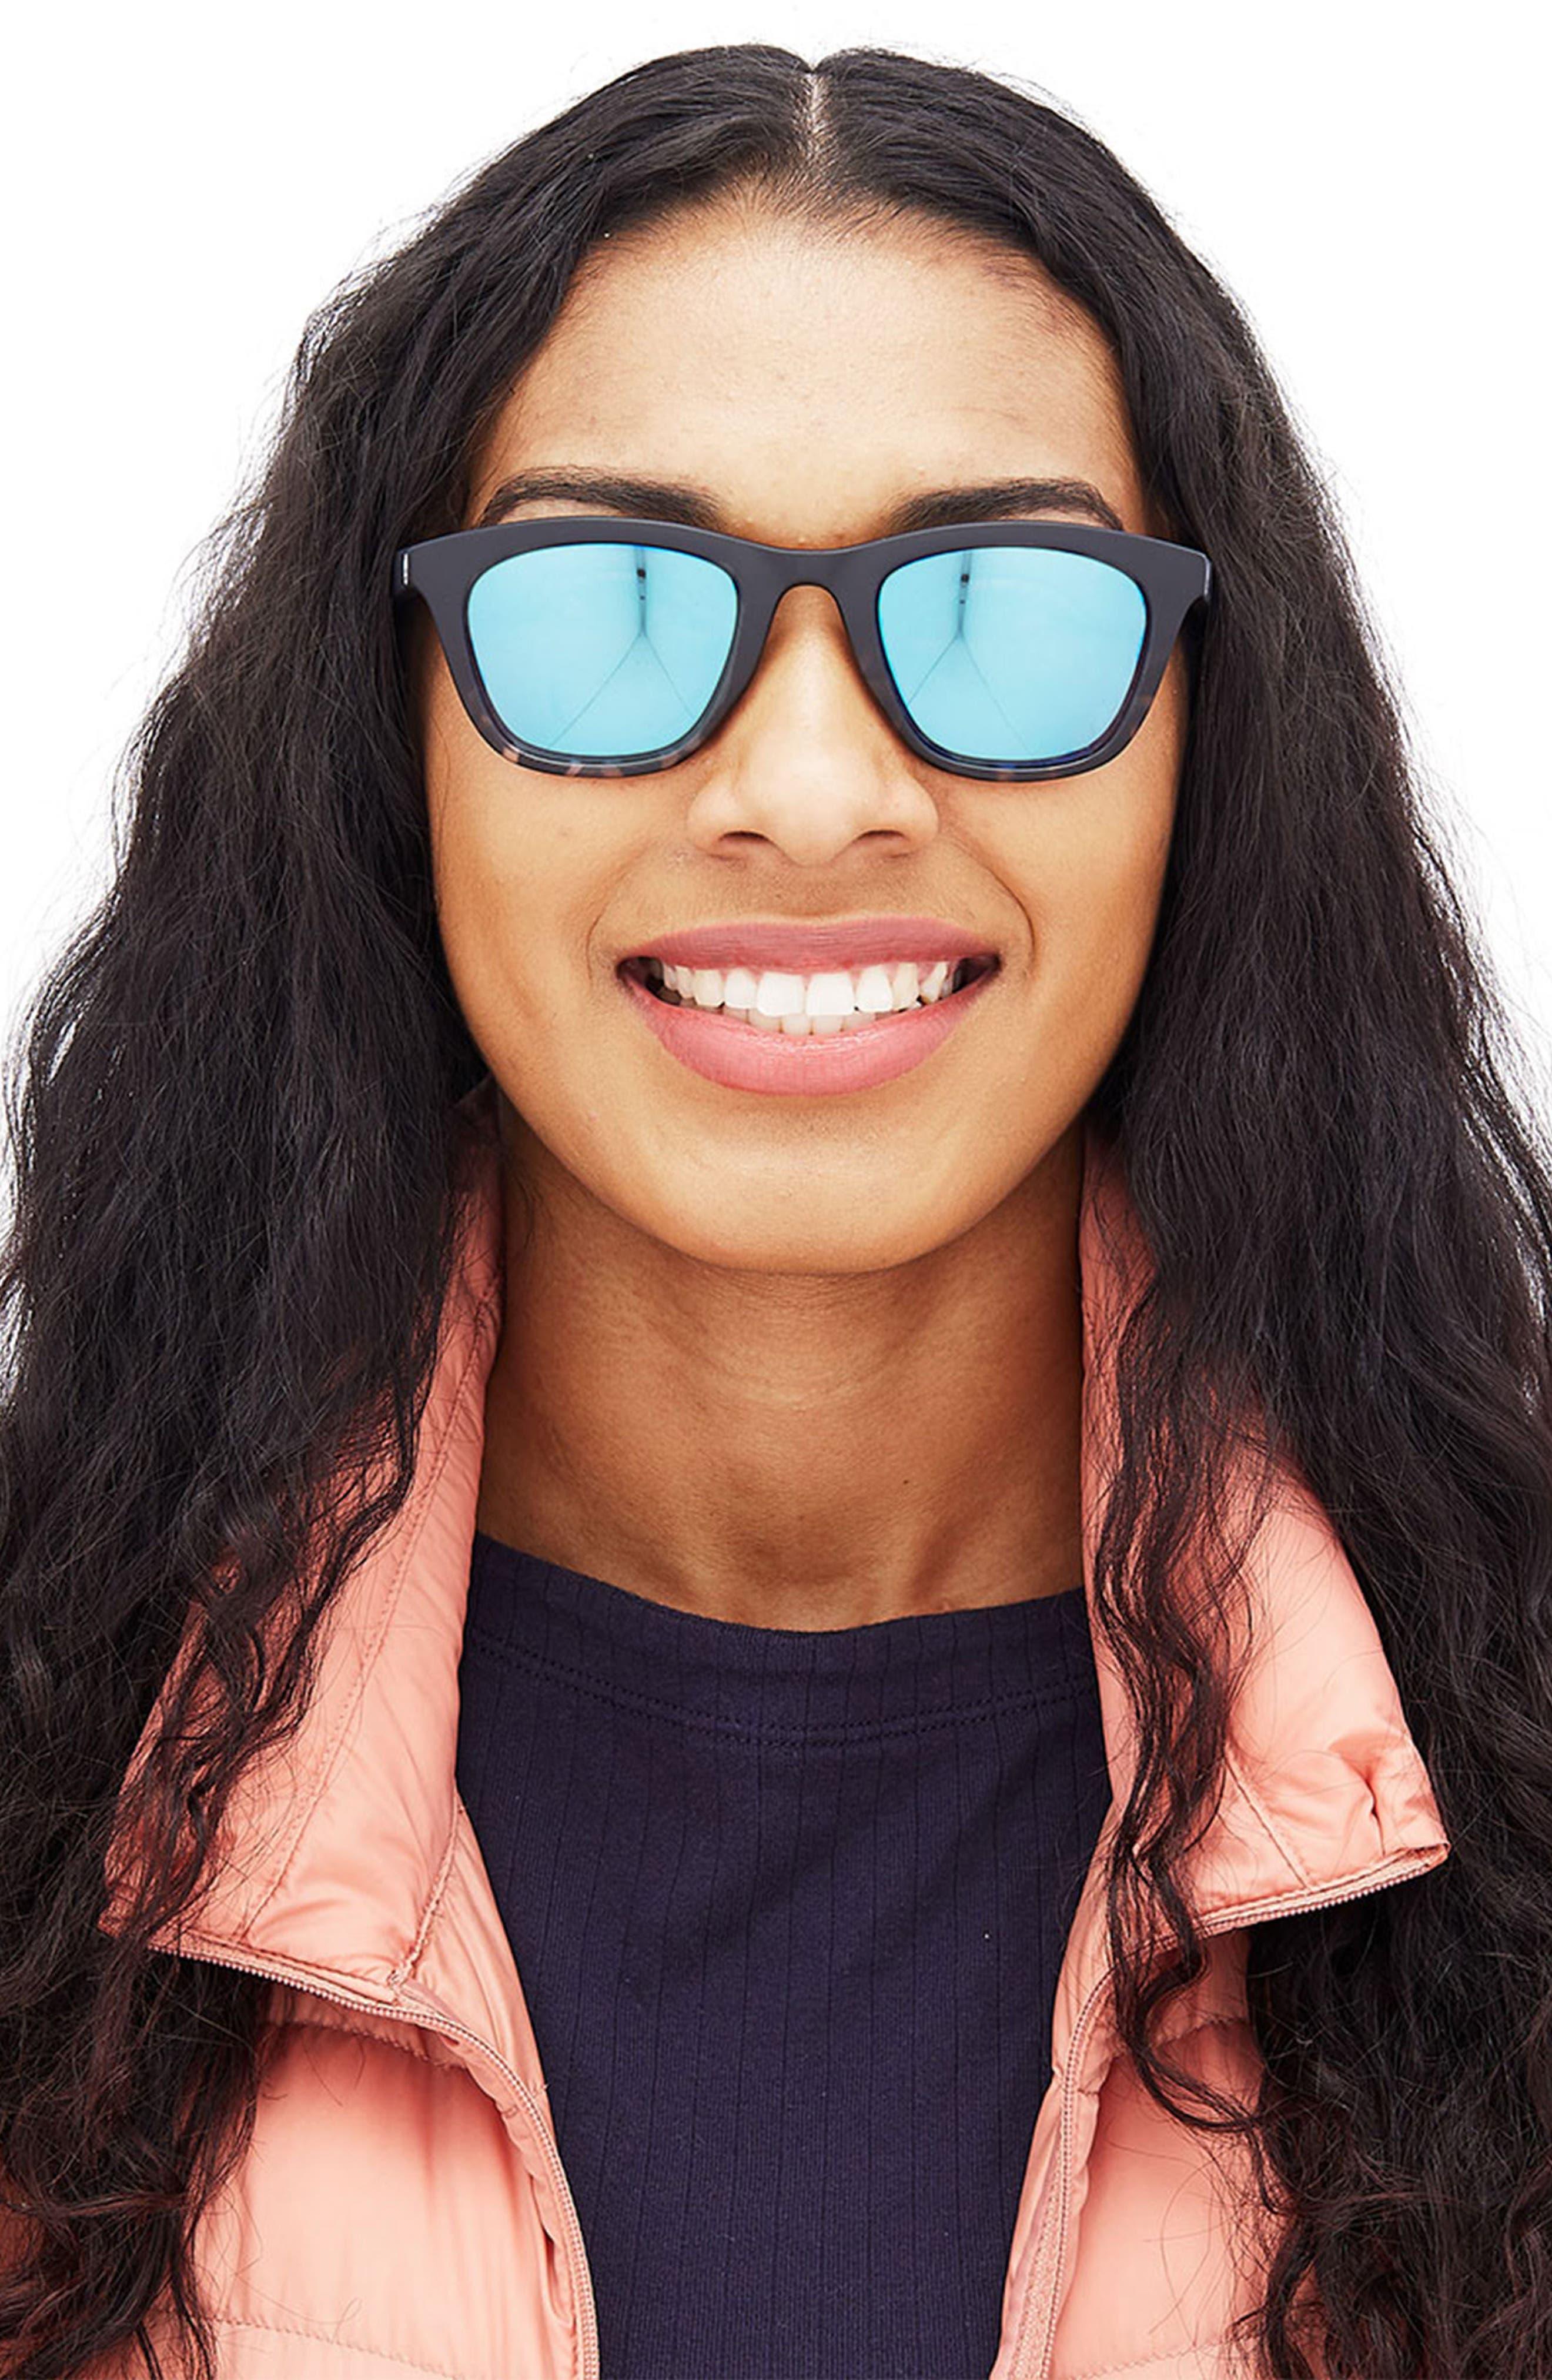 Manresa 49mm Polarized Sunglasses,                             Alternate thumbnail 5, color,                             BLACK TORTOISE SLATE